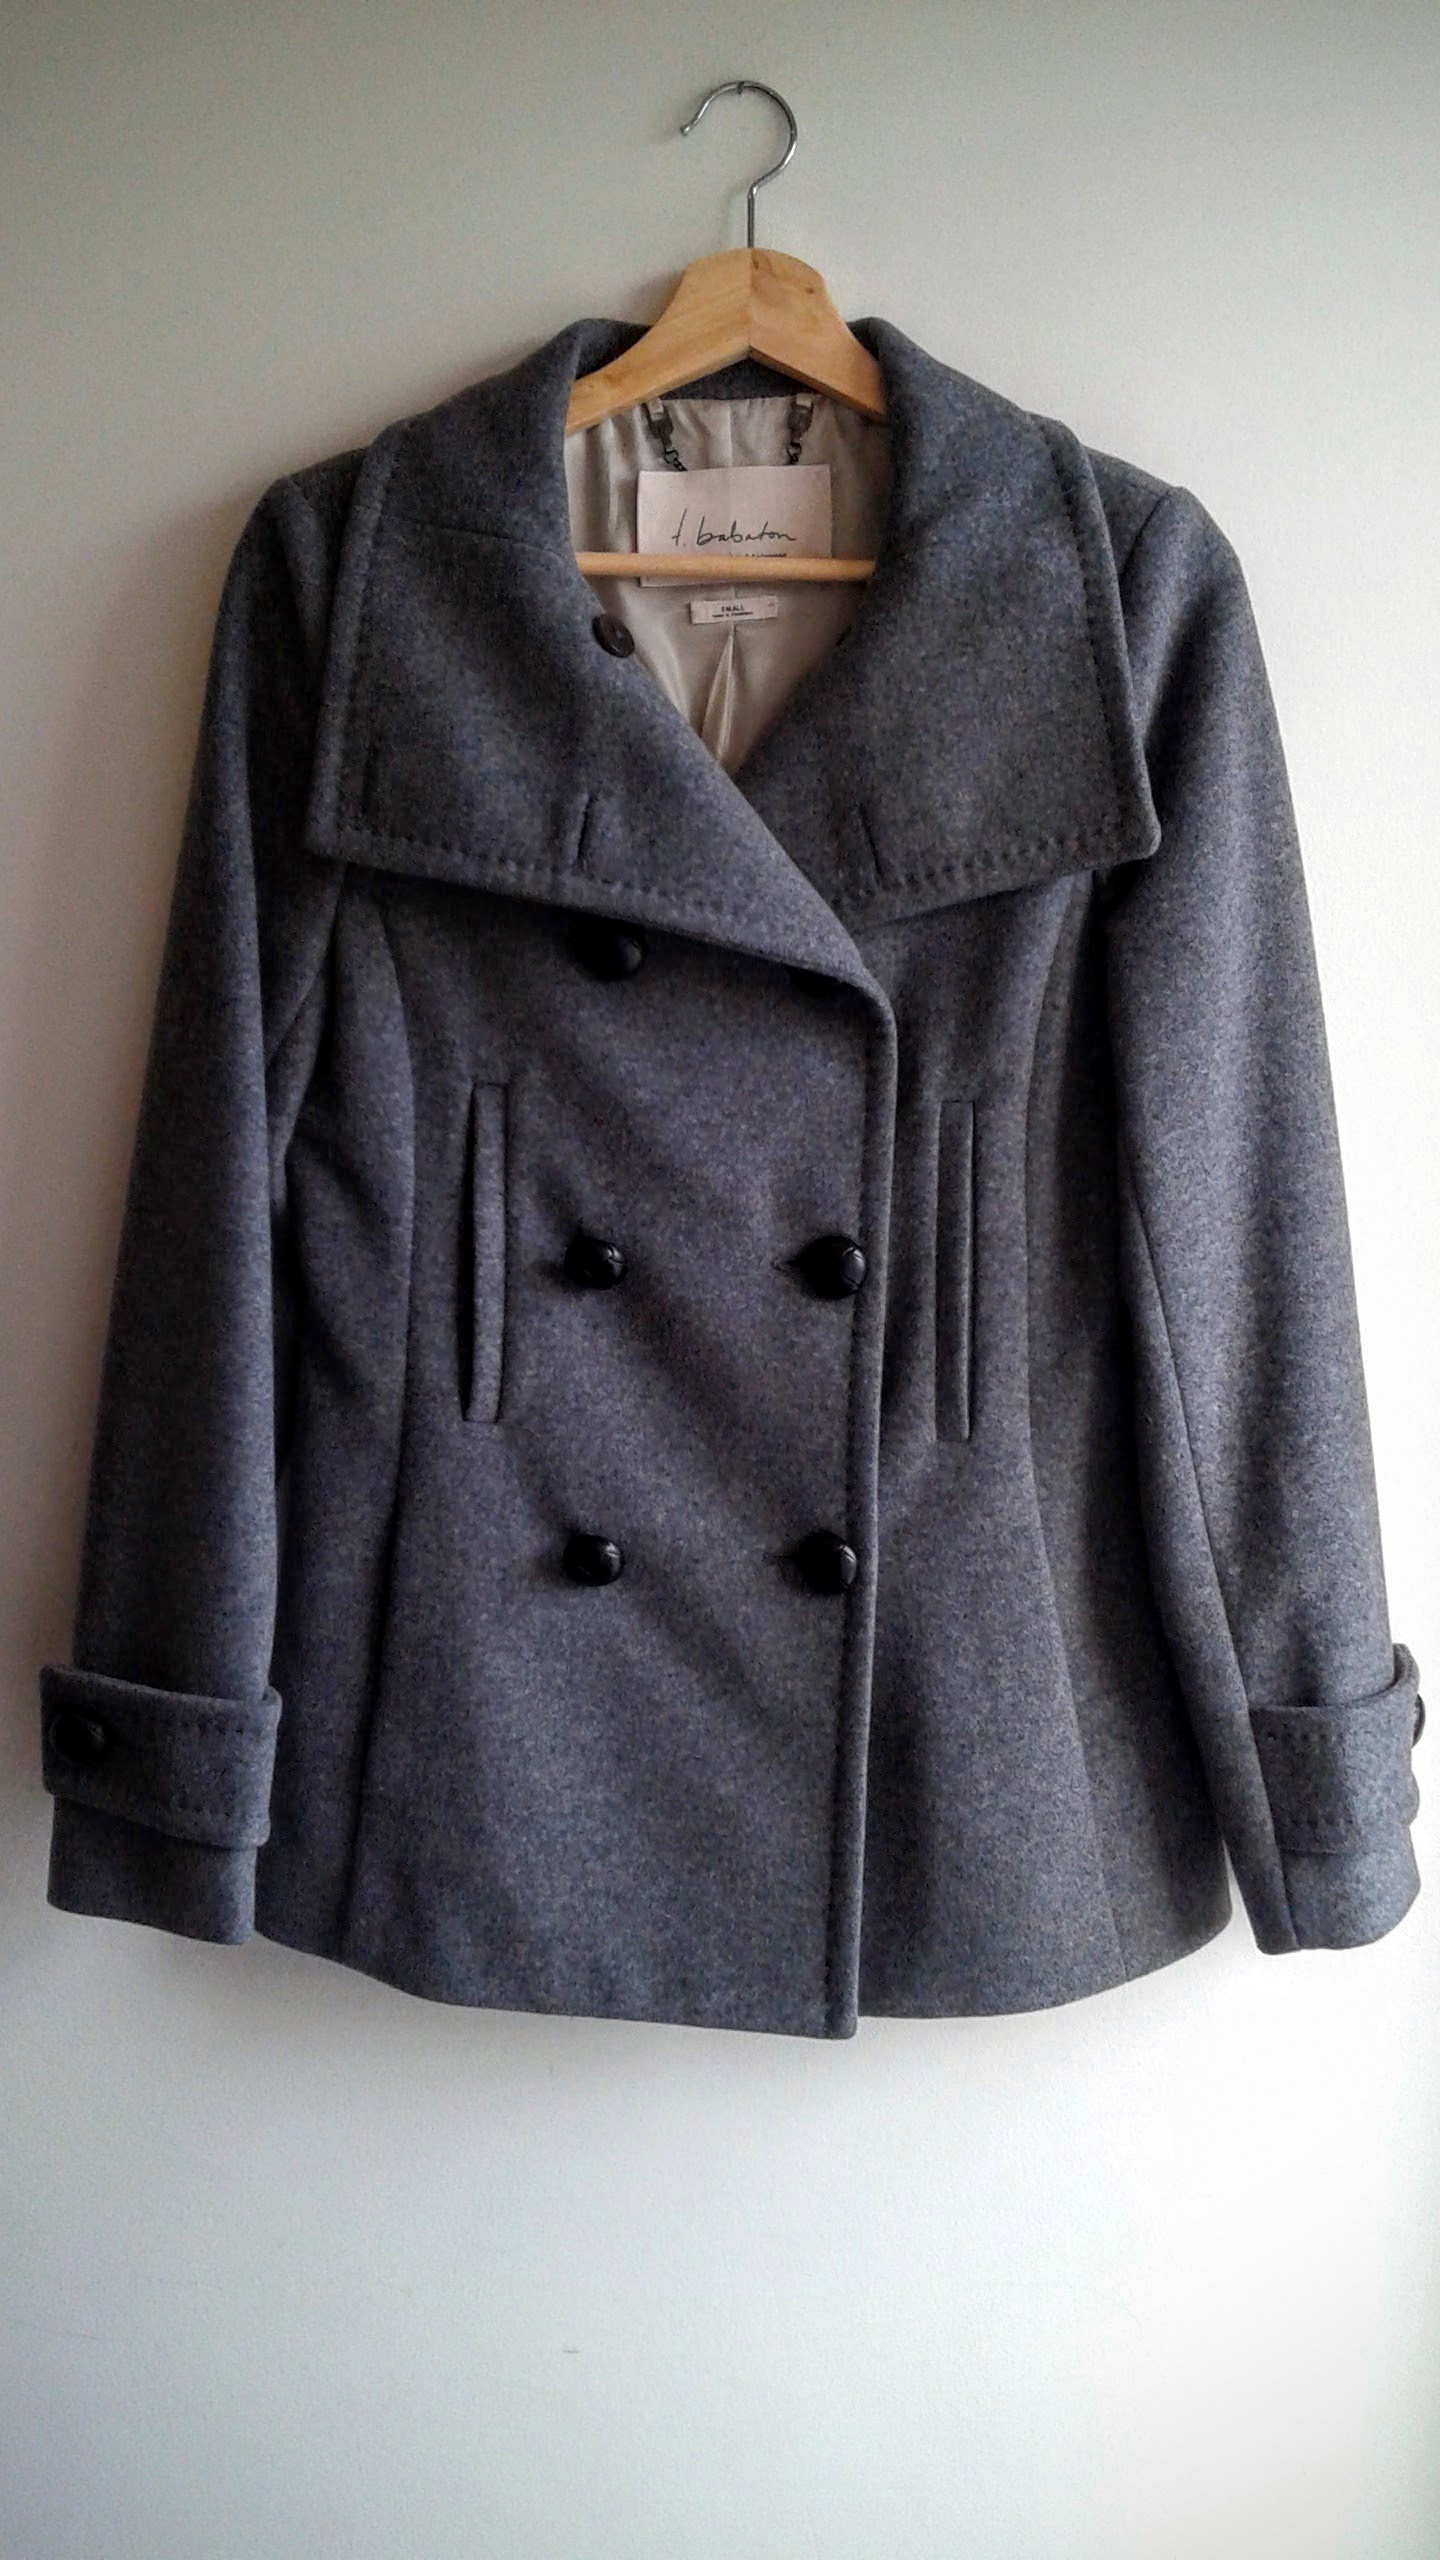 Babaton coat; Size S, $95